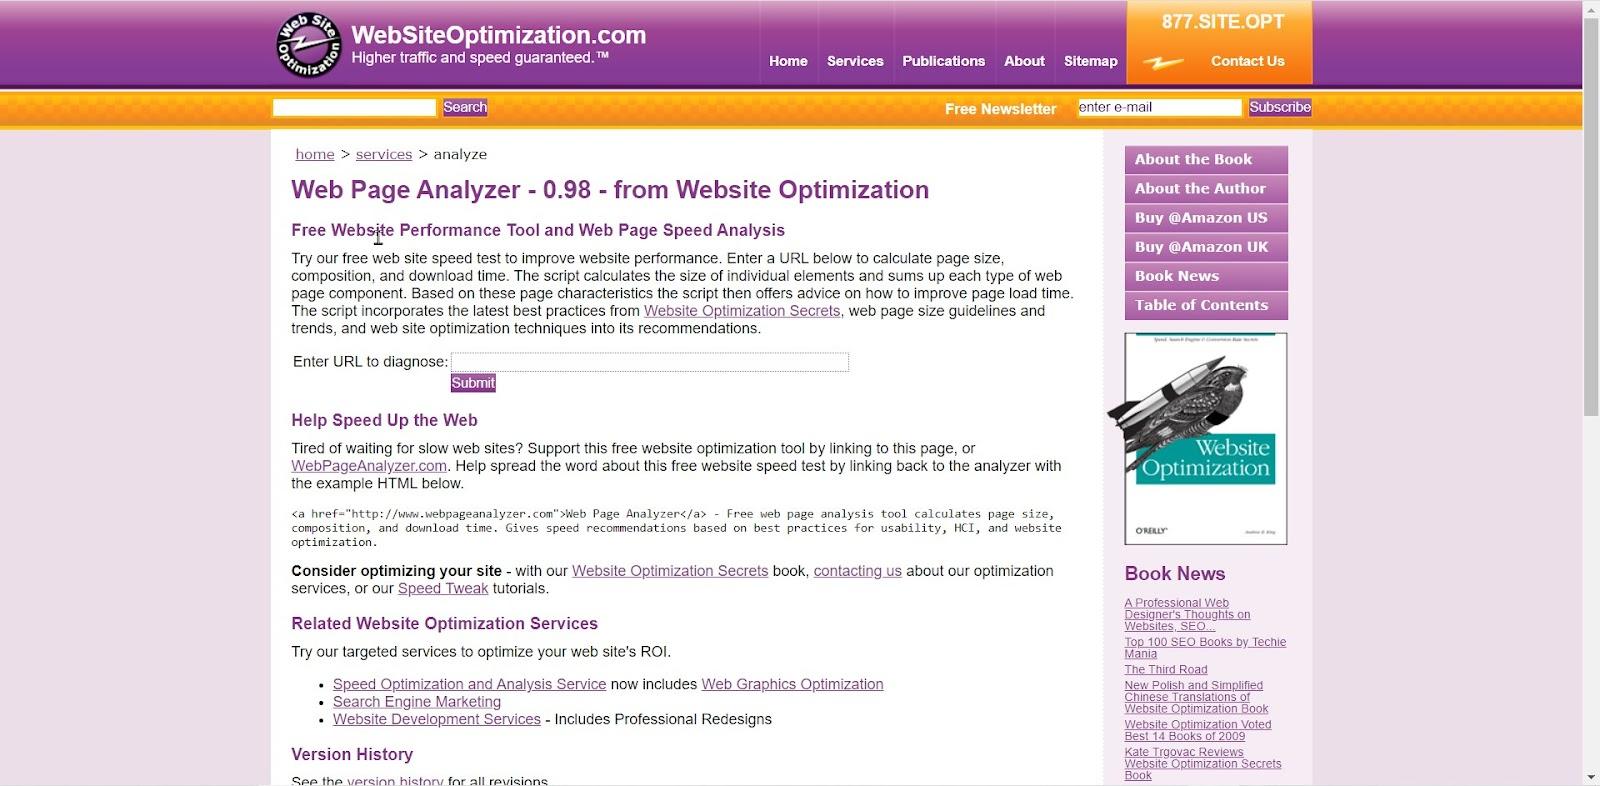 http://www.websiteoptimization.com/